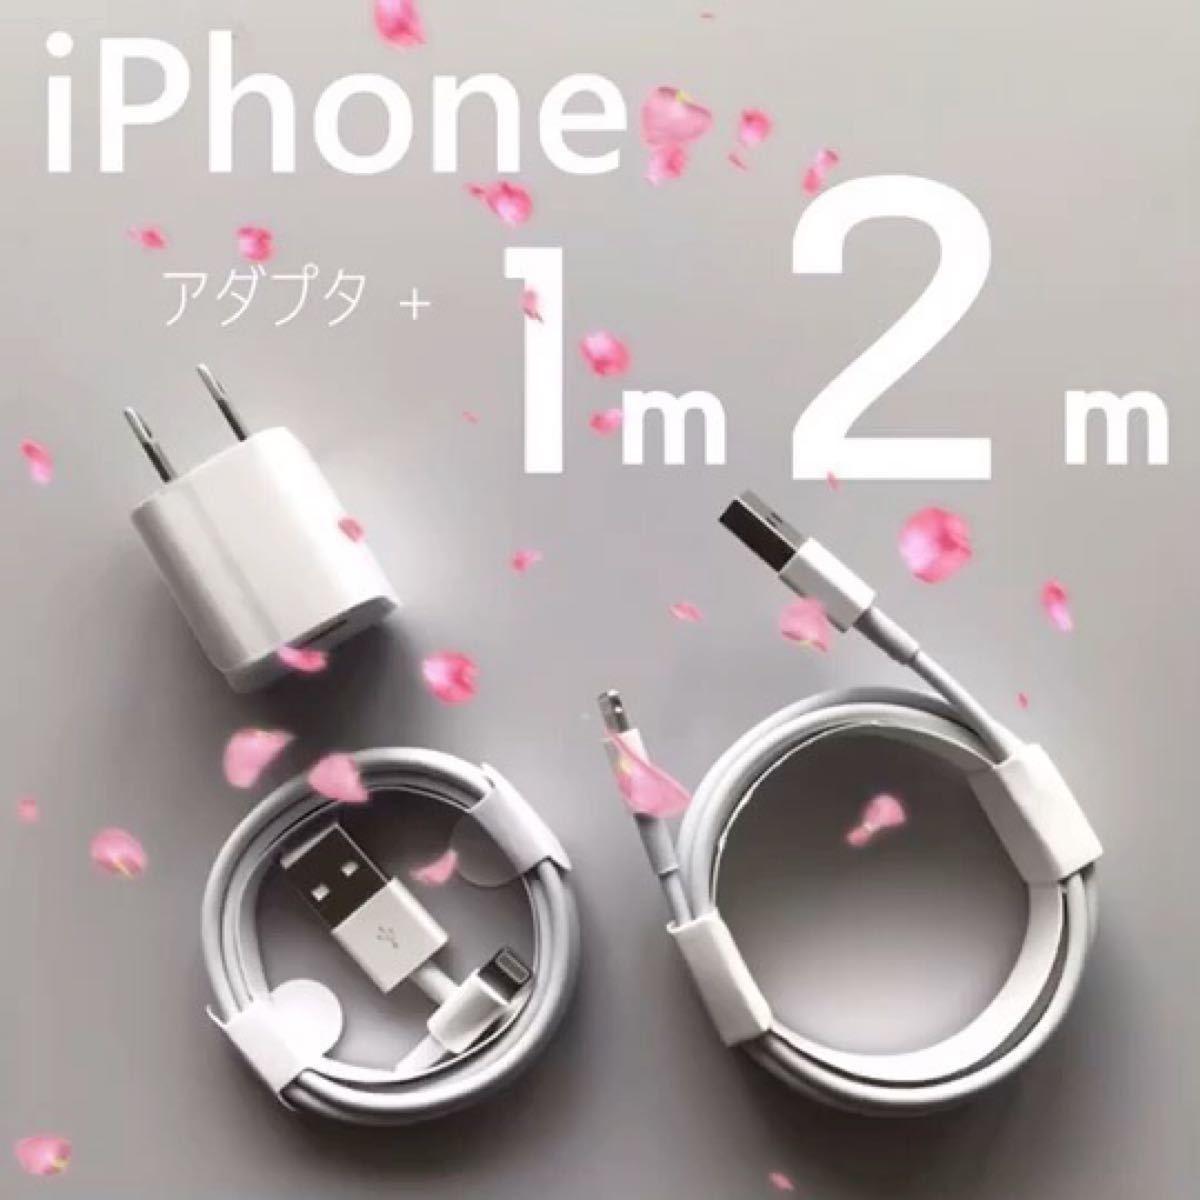 iPhone 充電ケーブル 充電器 コード アダプター ケーブル1m.2m.アダプター 3点セット